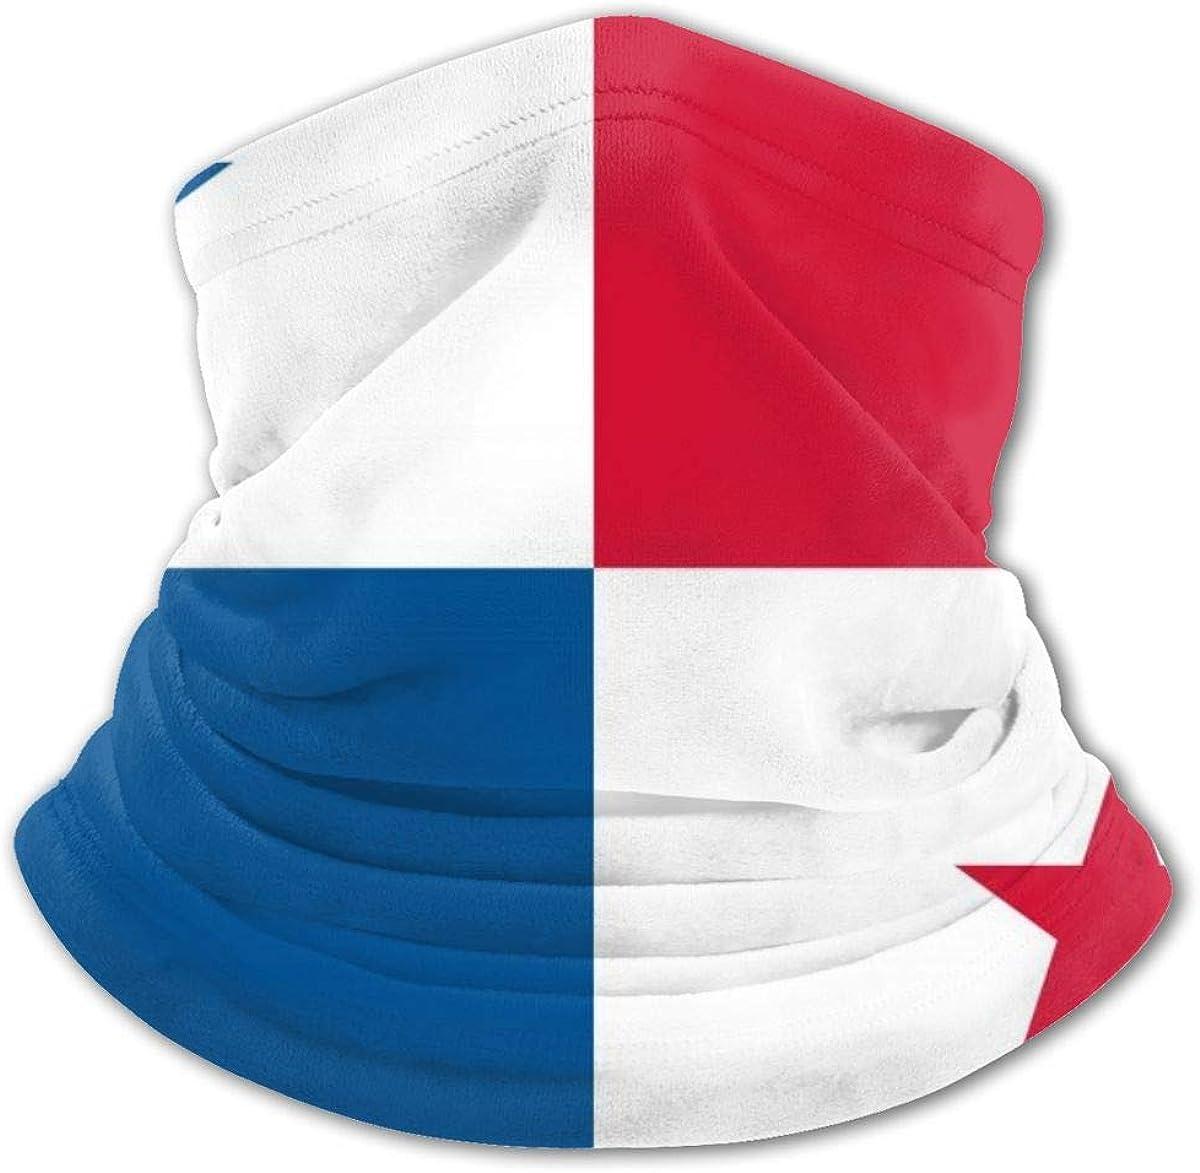 Flag Of Panama Headwear For Girls And Boys, Head Wrap, Neck Gaiter, Headband, Tenn Fishing Mask, Magic Scarf, Tube Mask, Face Bandana Mask For Camping Running Cycling